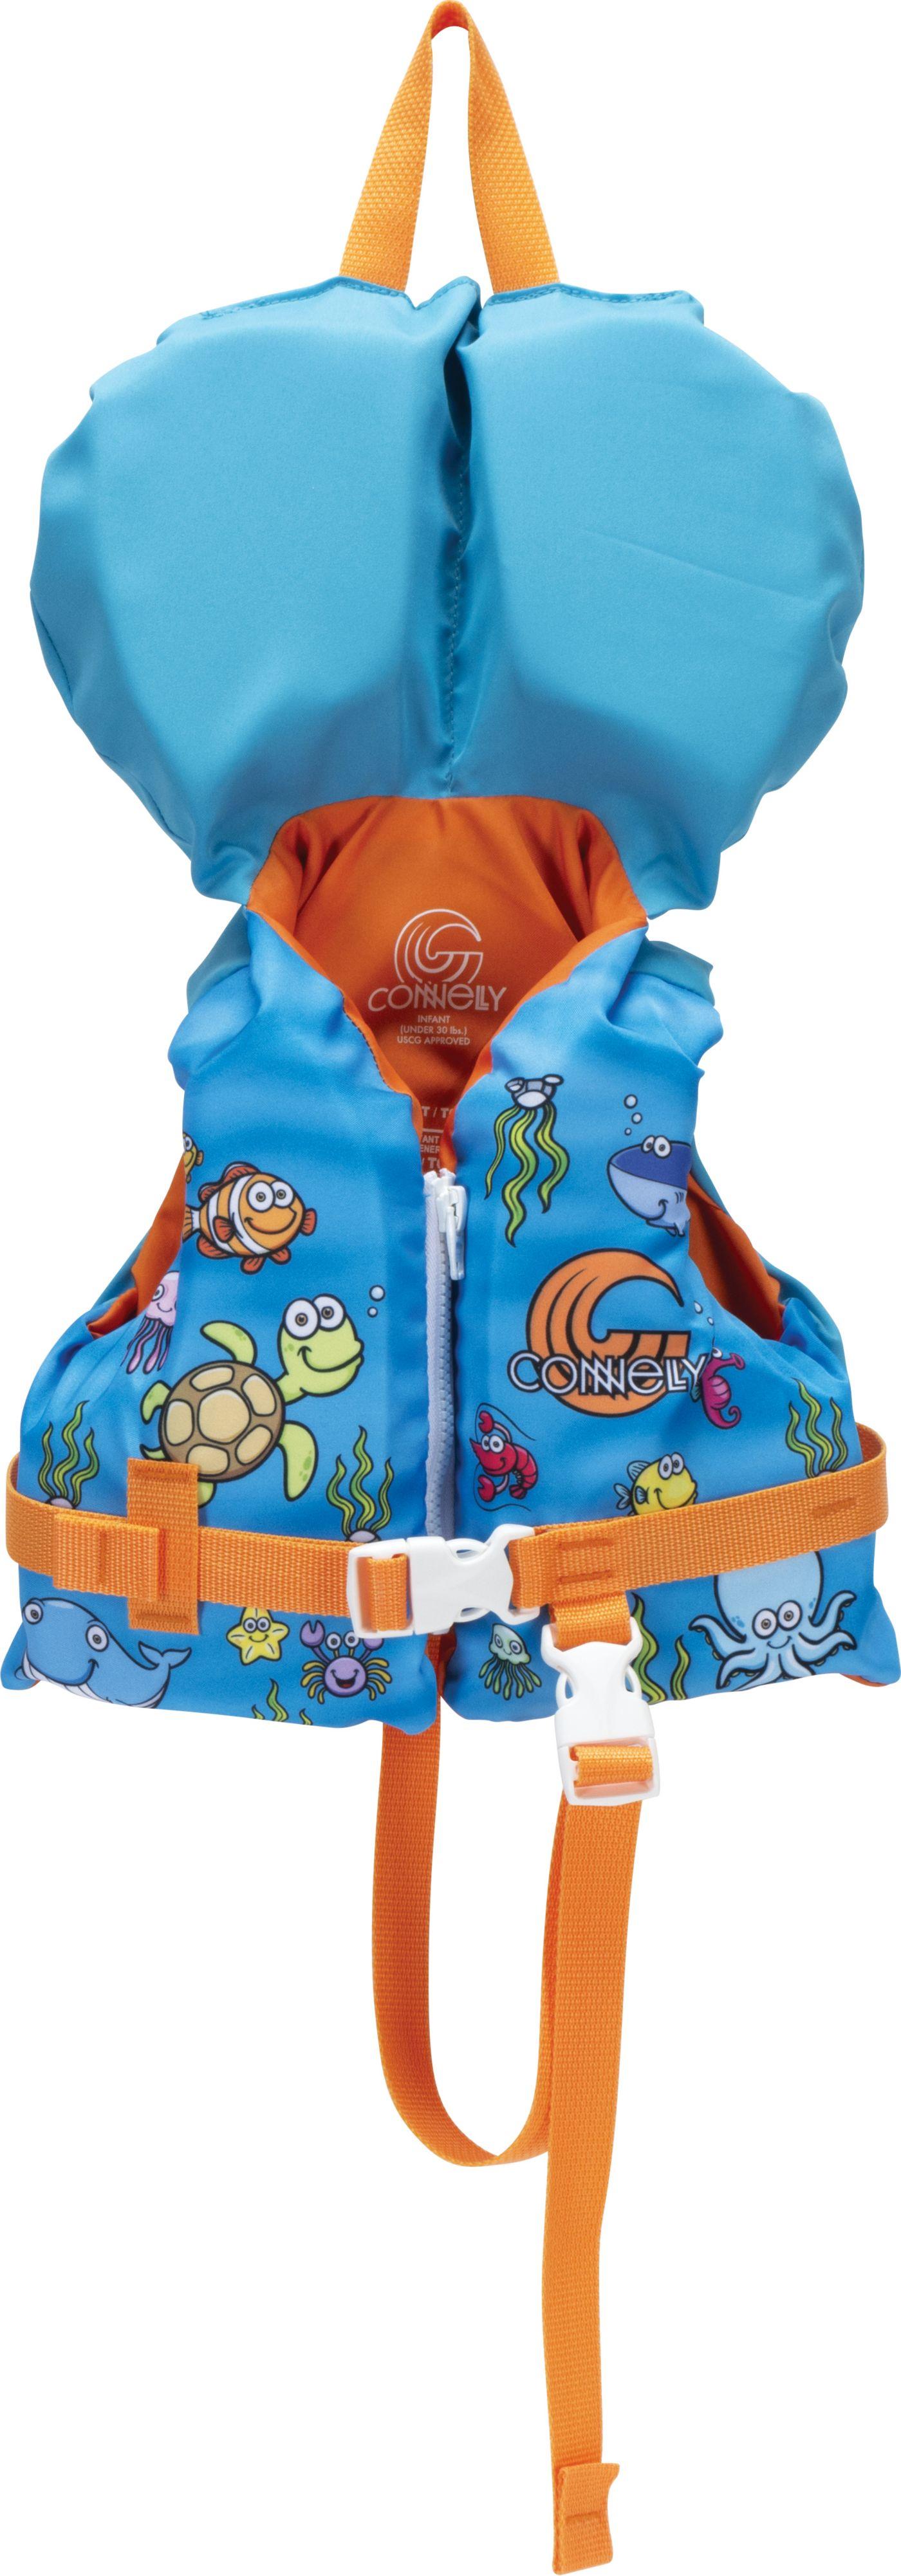 Connelly Boys' Infant Premium Nylon Life Vest